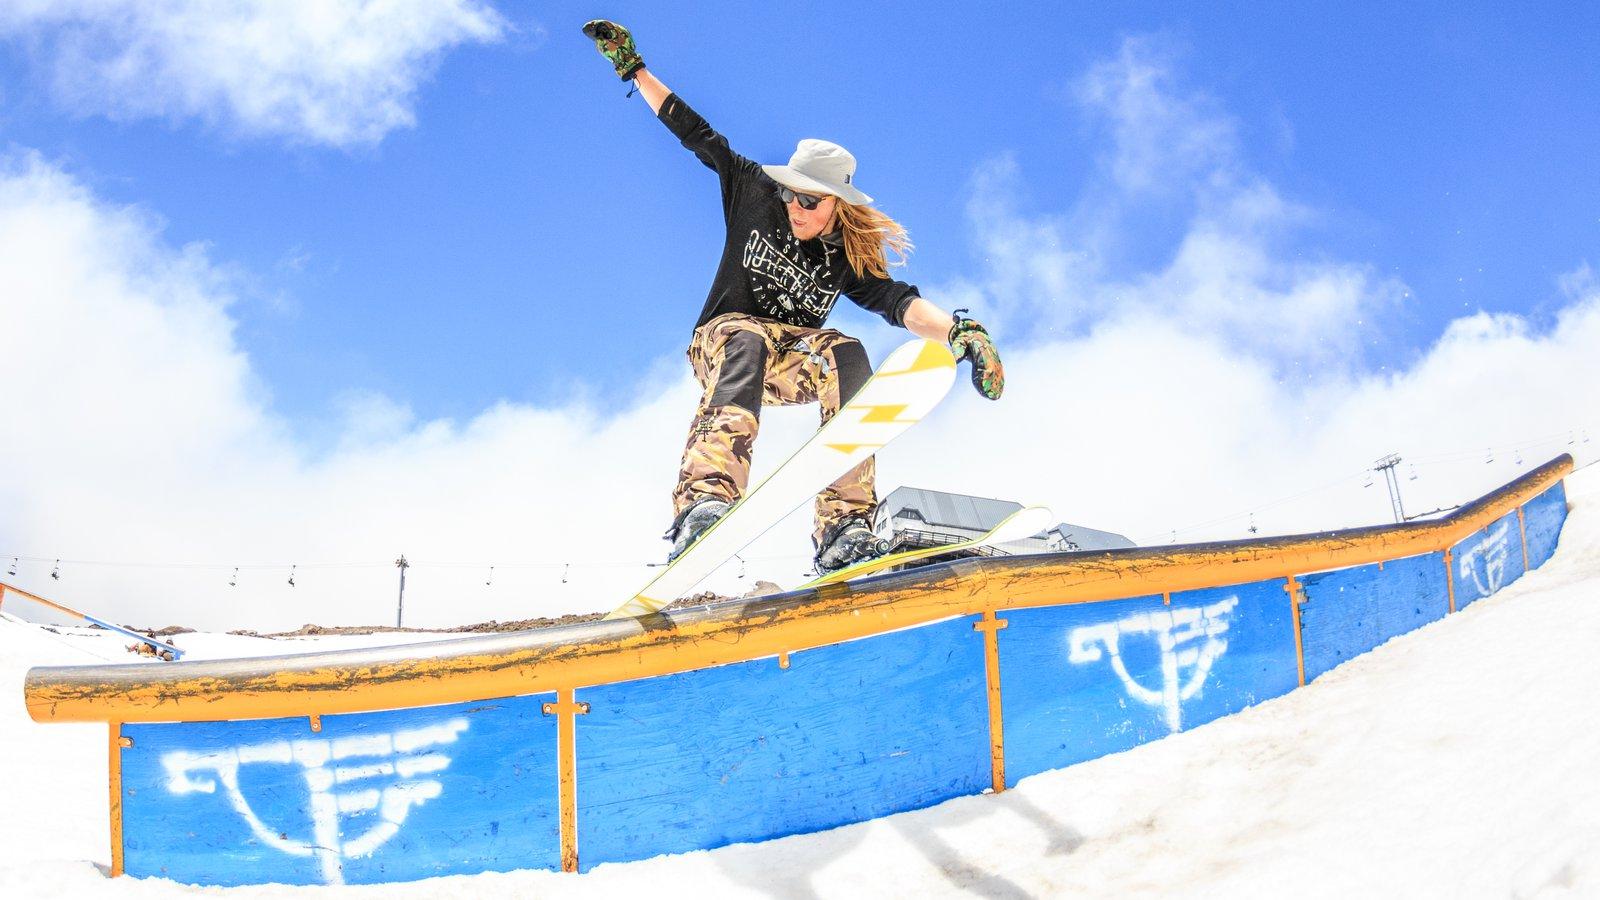 Callaghan Skier Filmer Extraordinaire